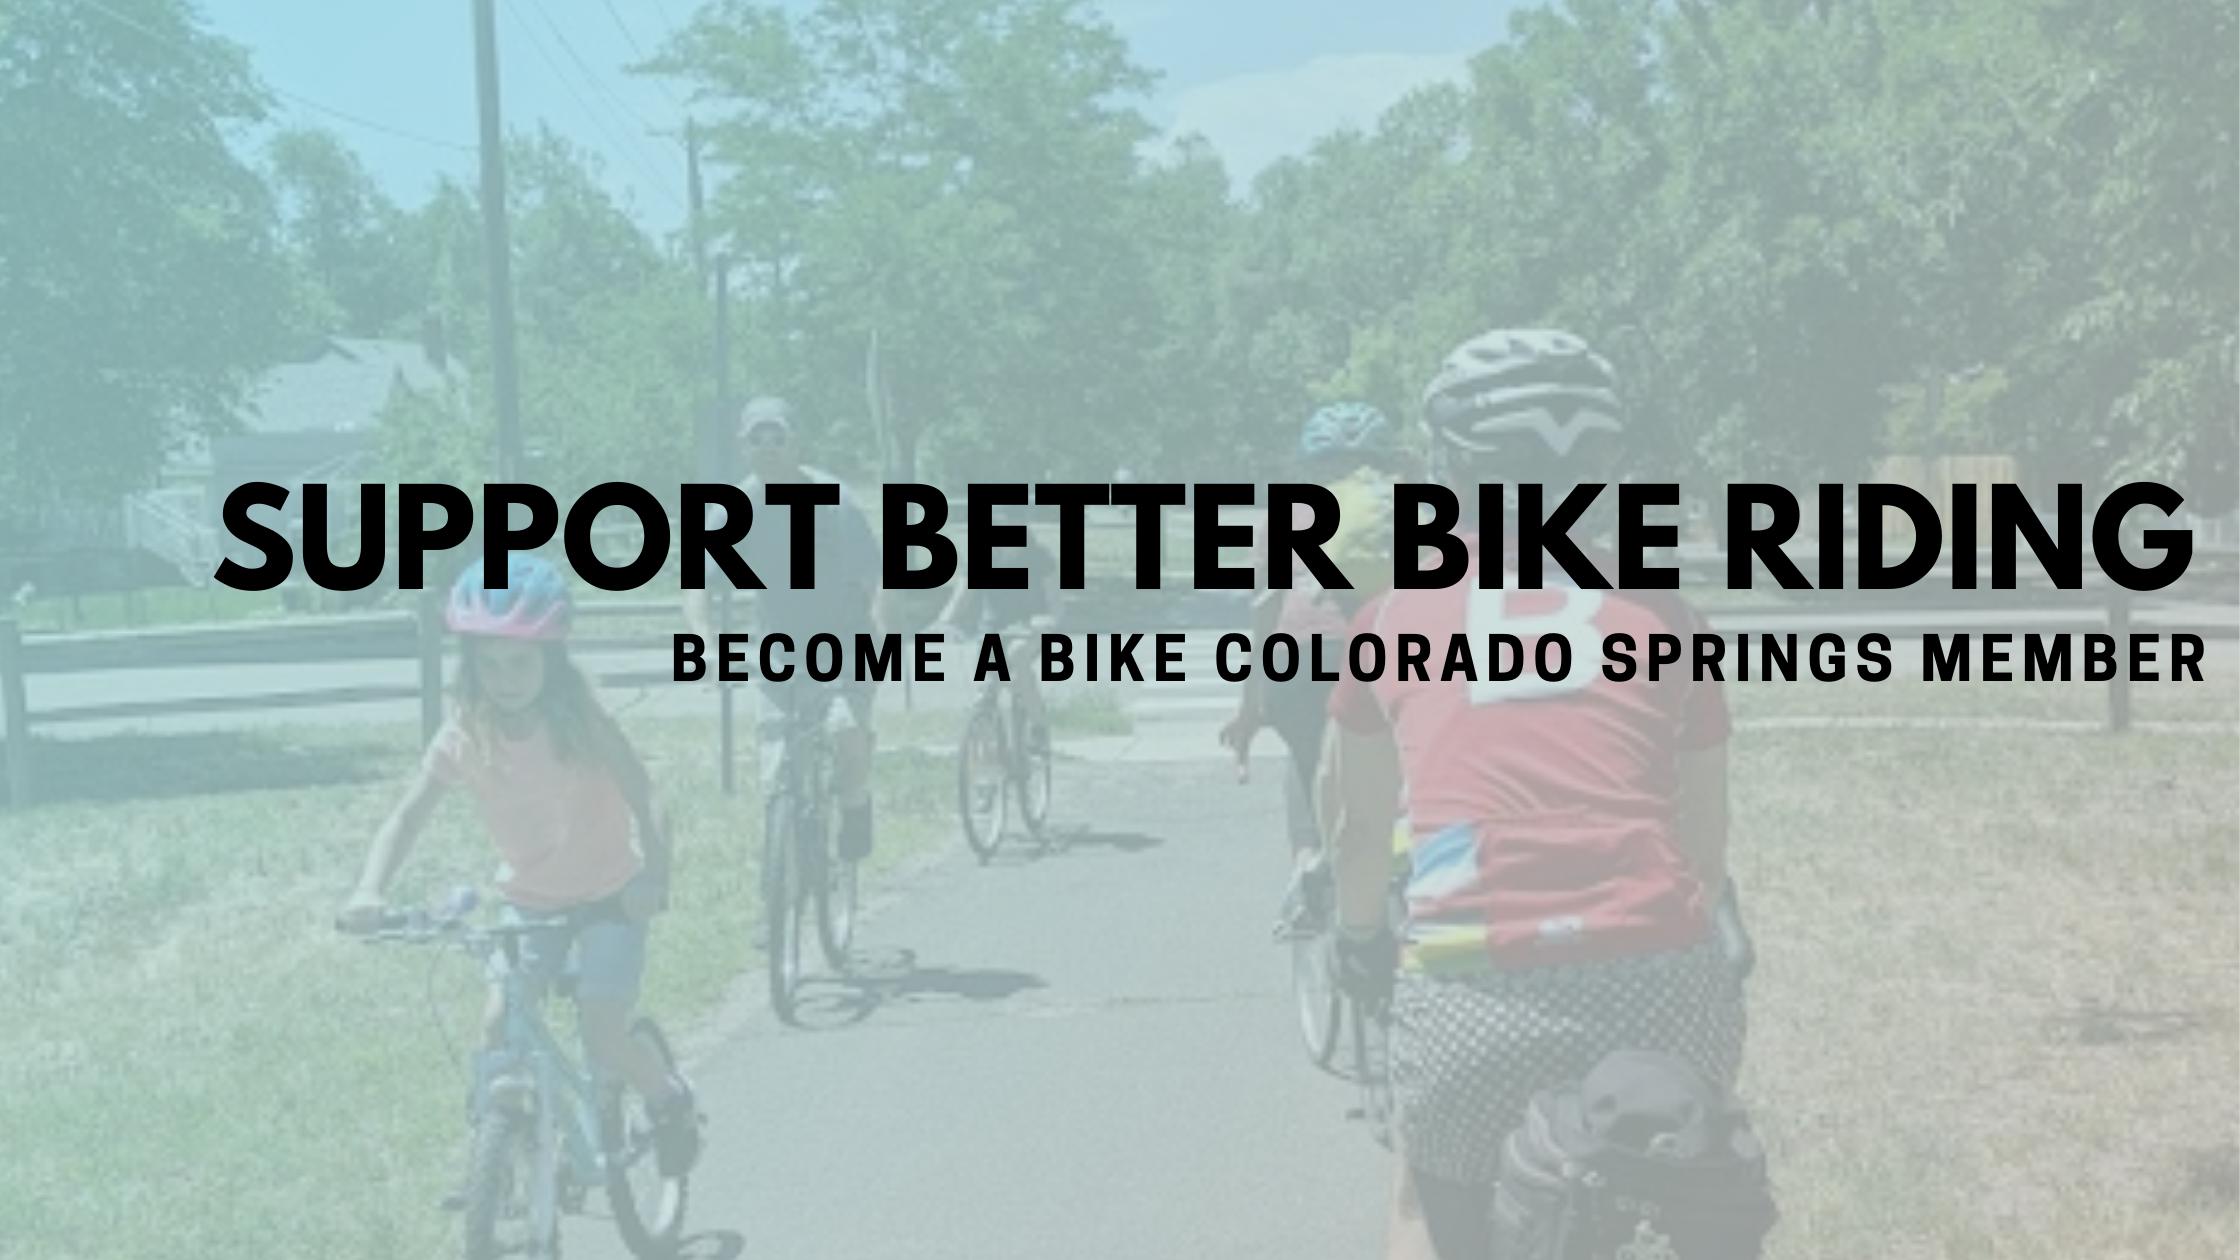 Support Better Bike Riding